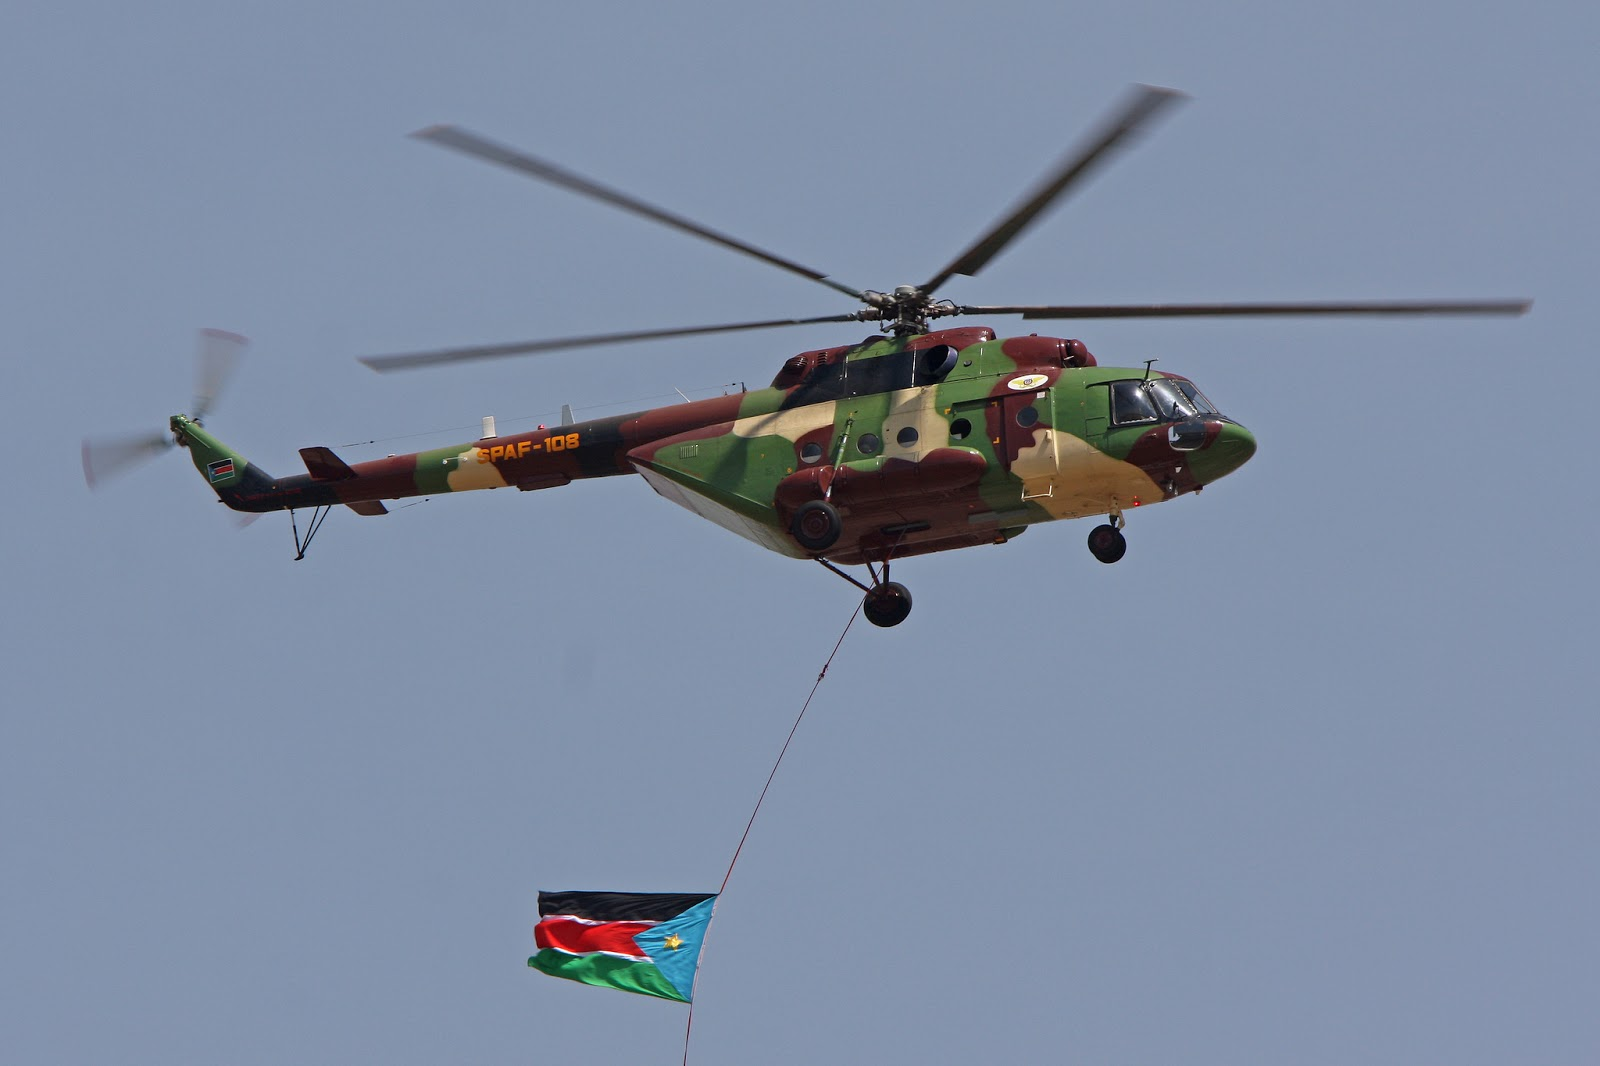 Armées du Sud Soudan MI-17V5+SPAF-108+21-01-2011